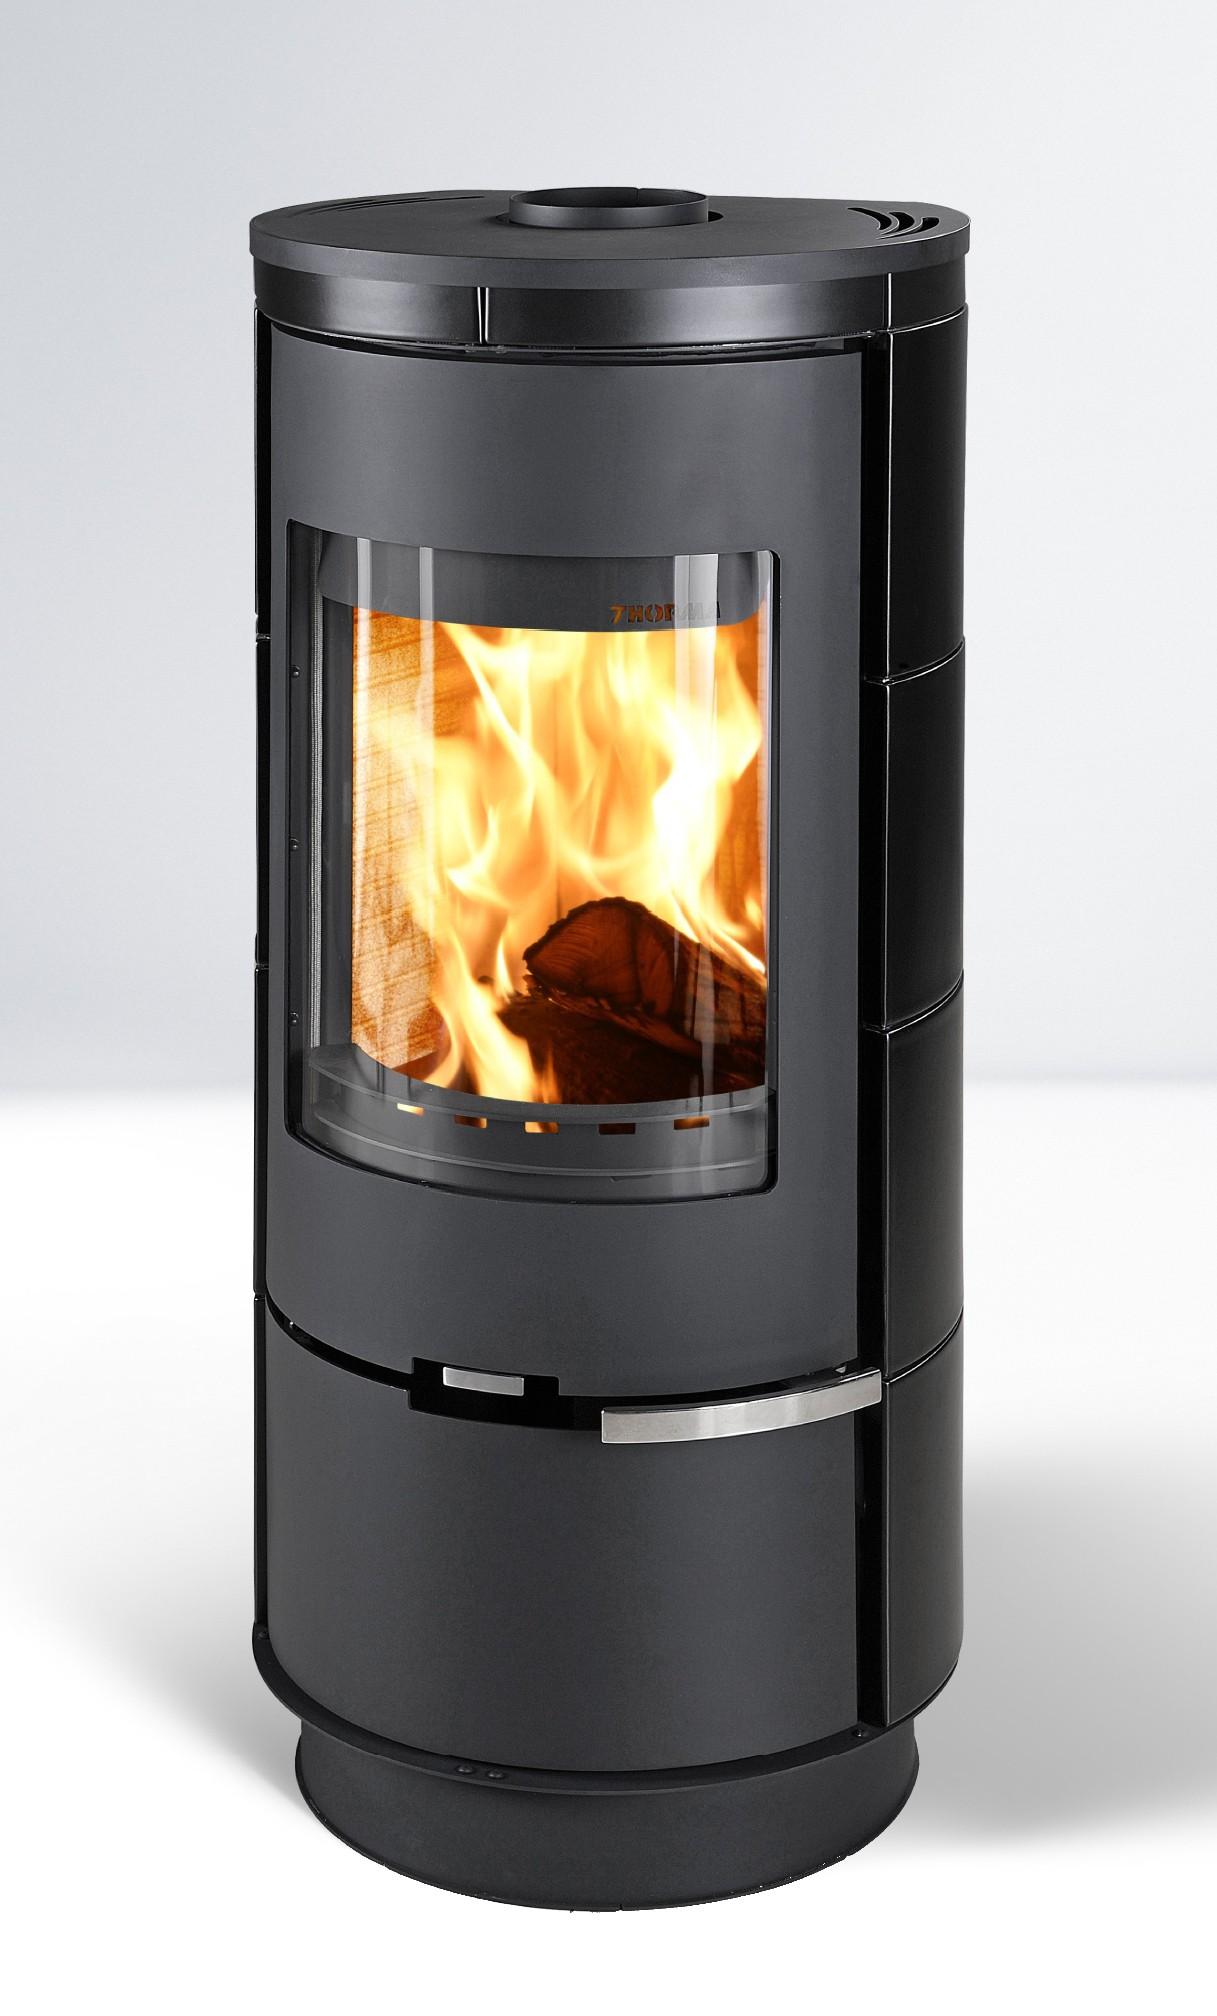 Kaminofen Thorma Andorra Keramik raumluftunabhängig schwarz 7,5 kW Bild 1